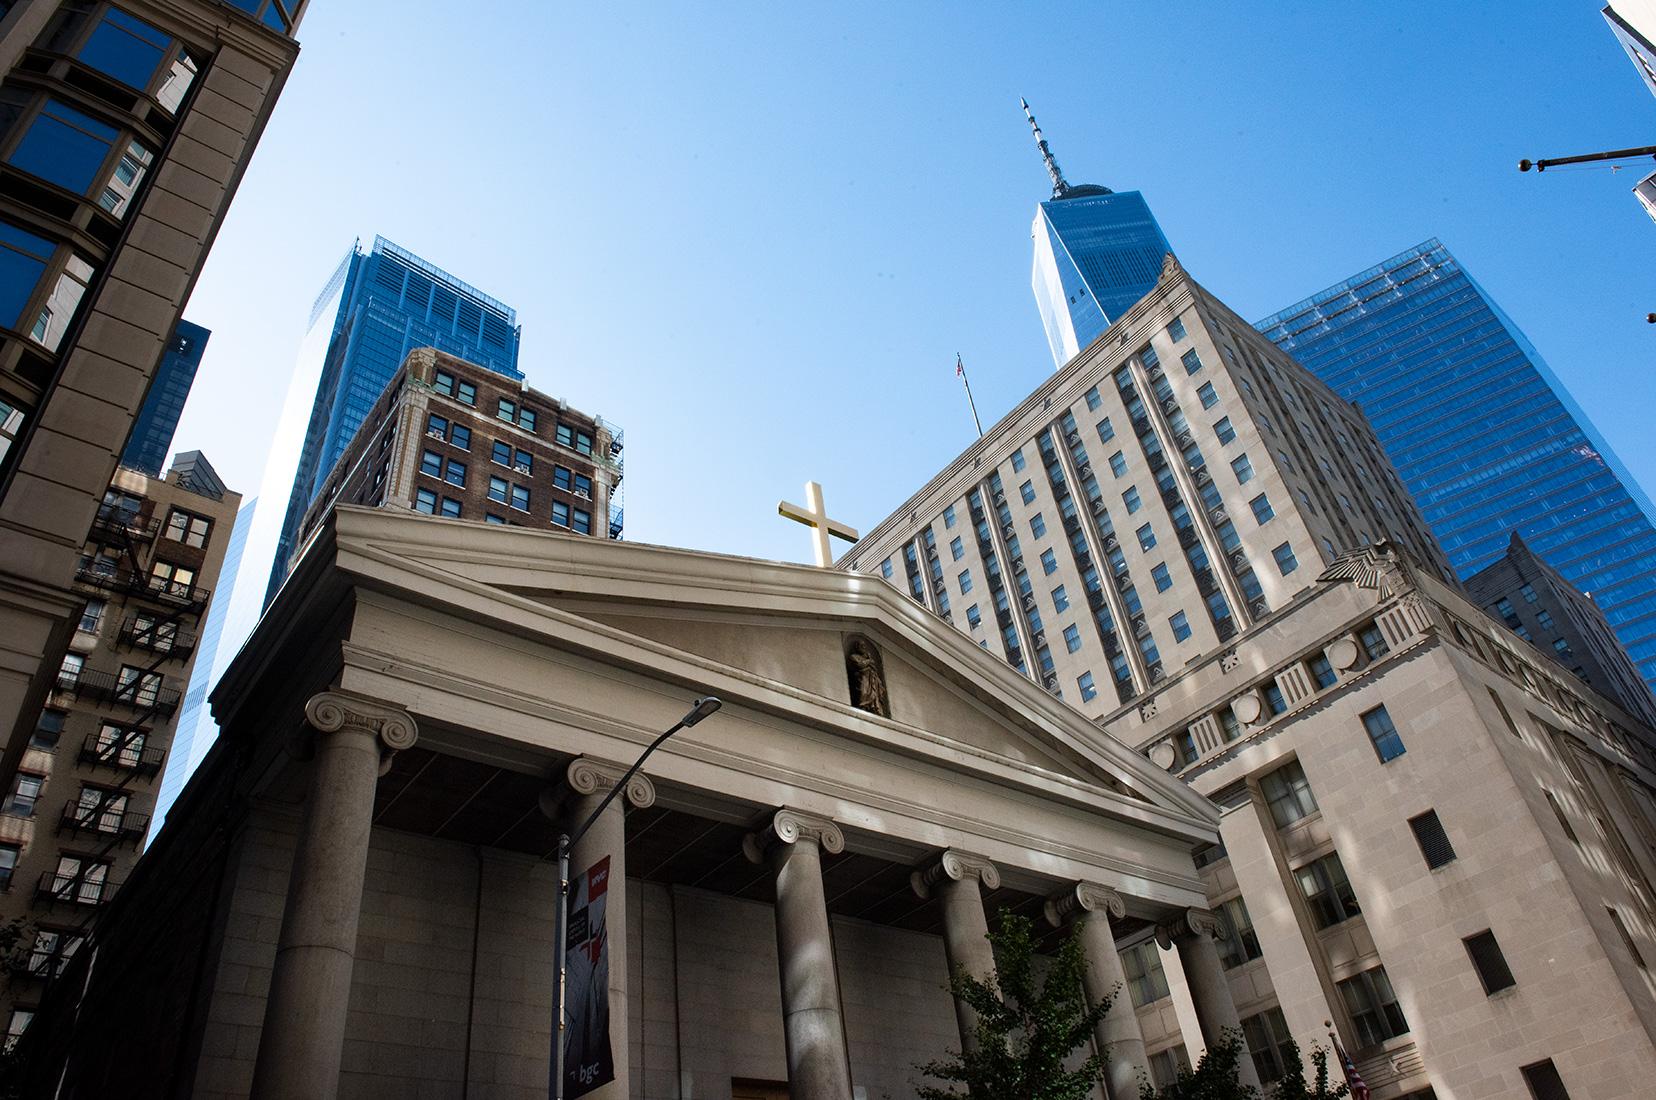 ST PETERS CHURCH NEW YORK CITY